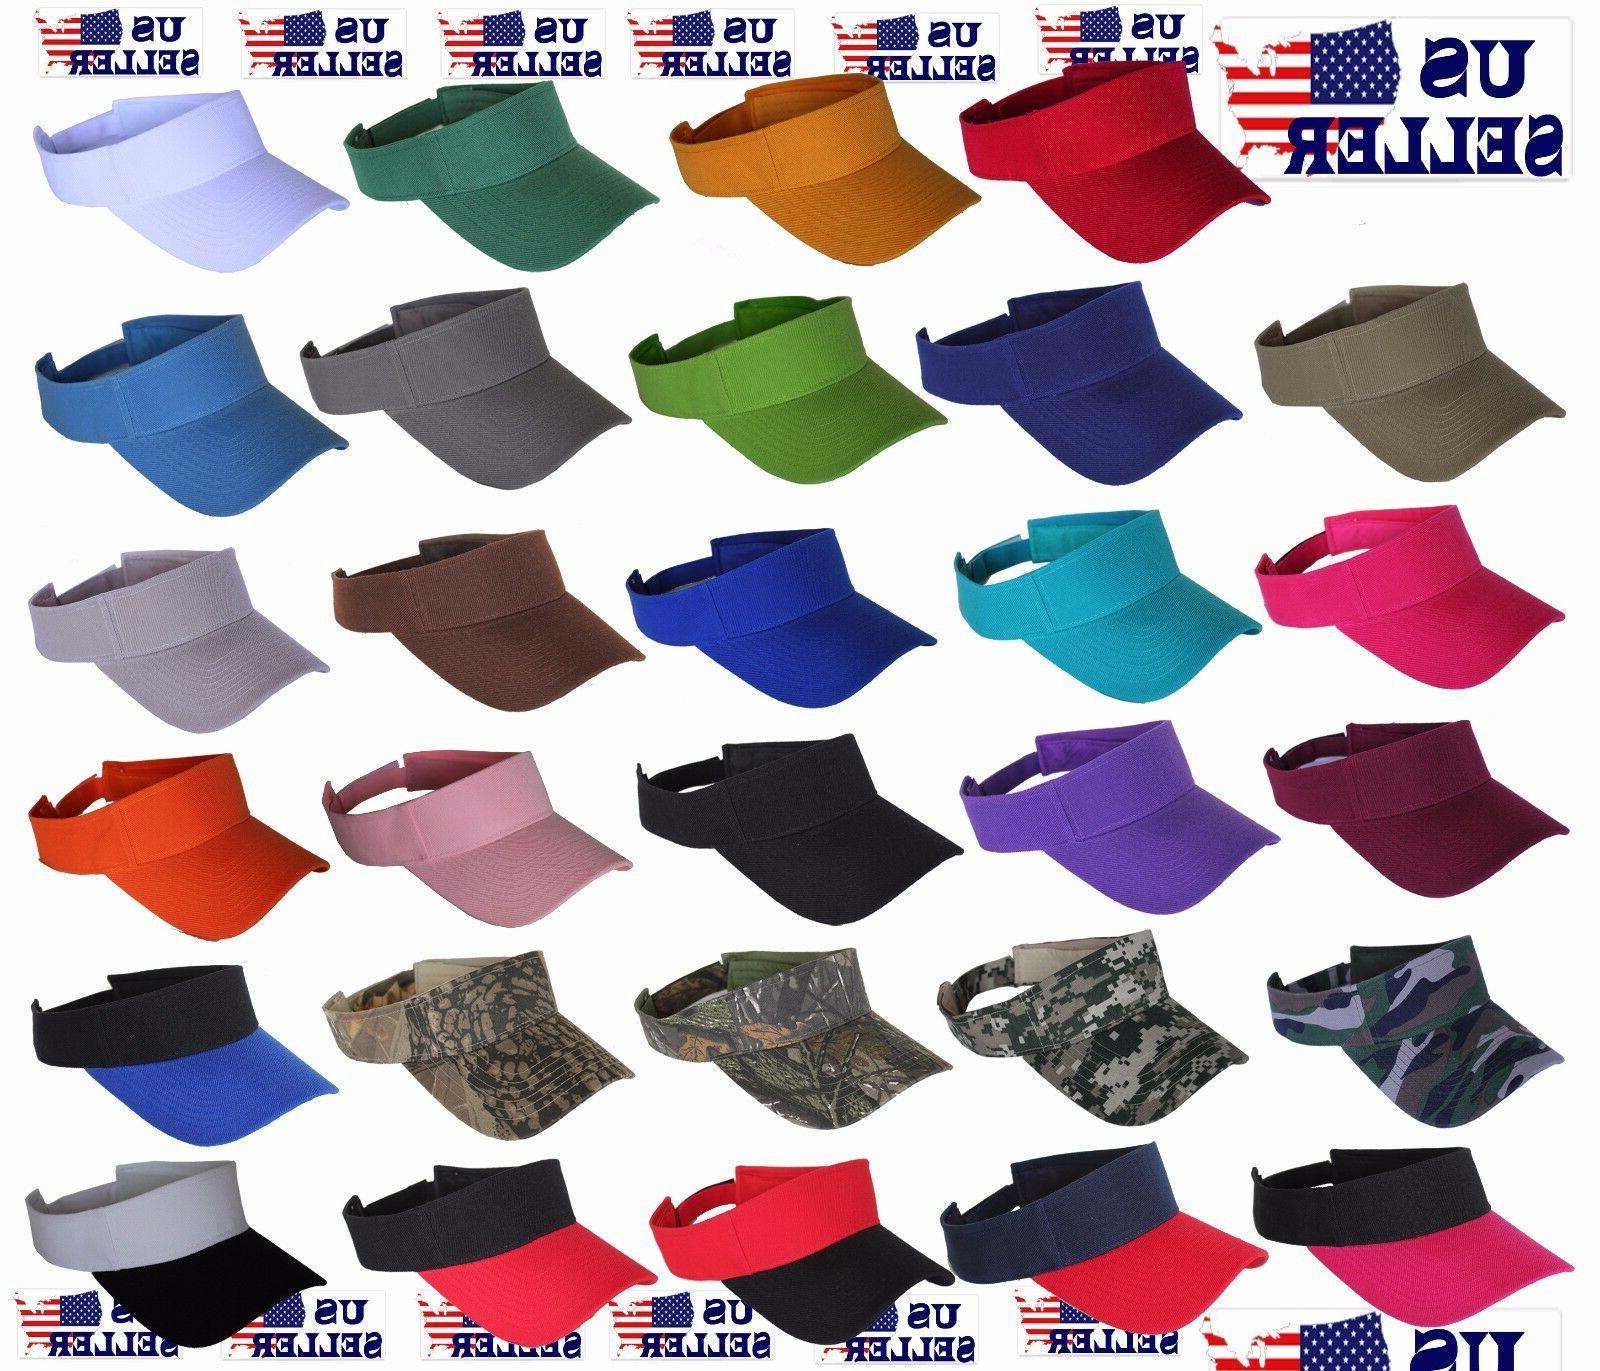 visor sun plain hat sports cap colors